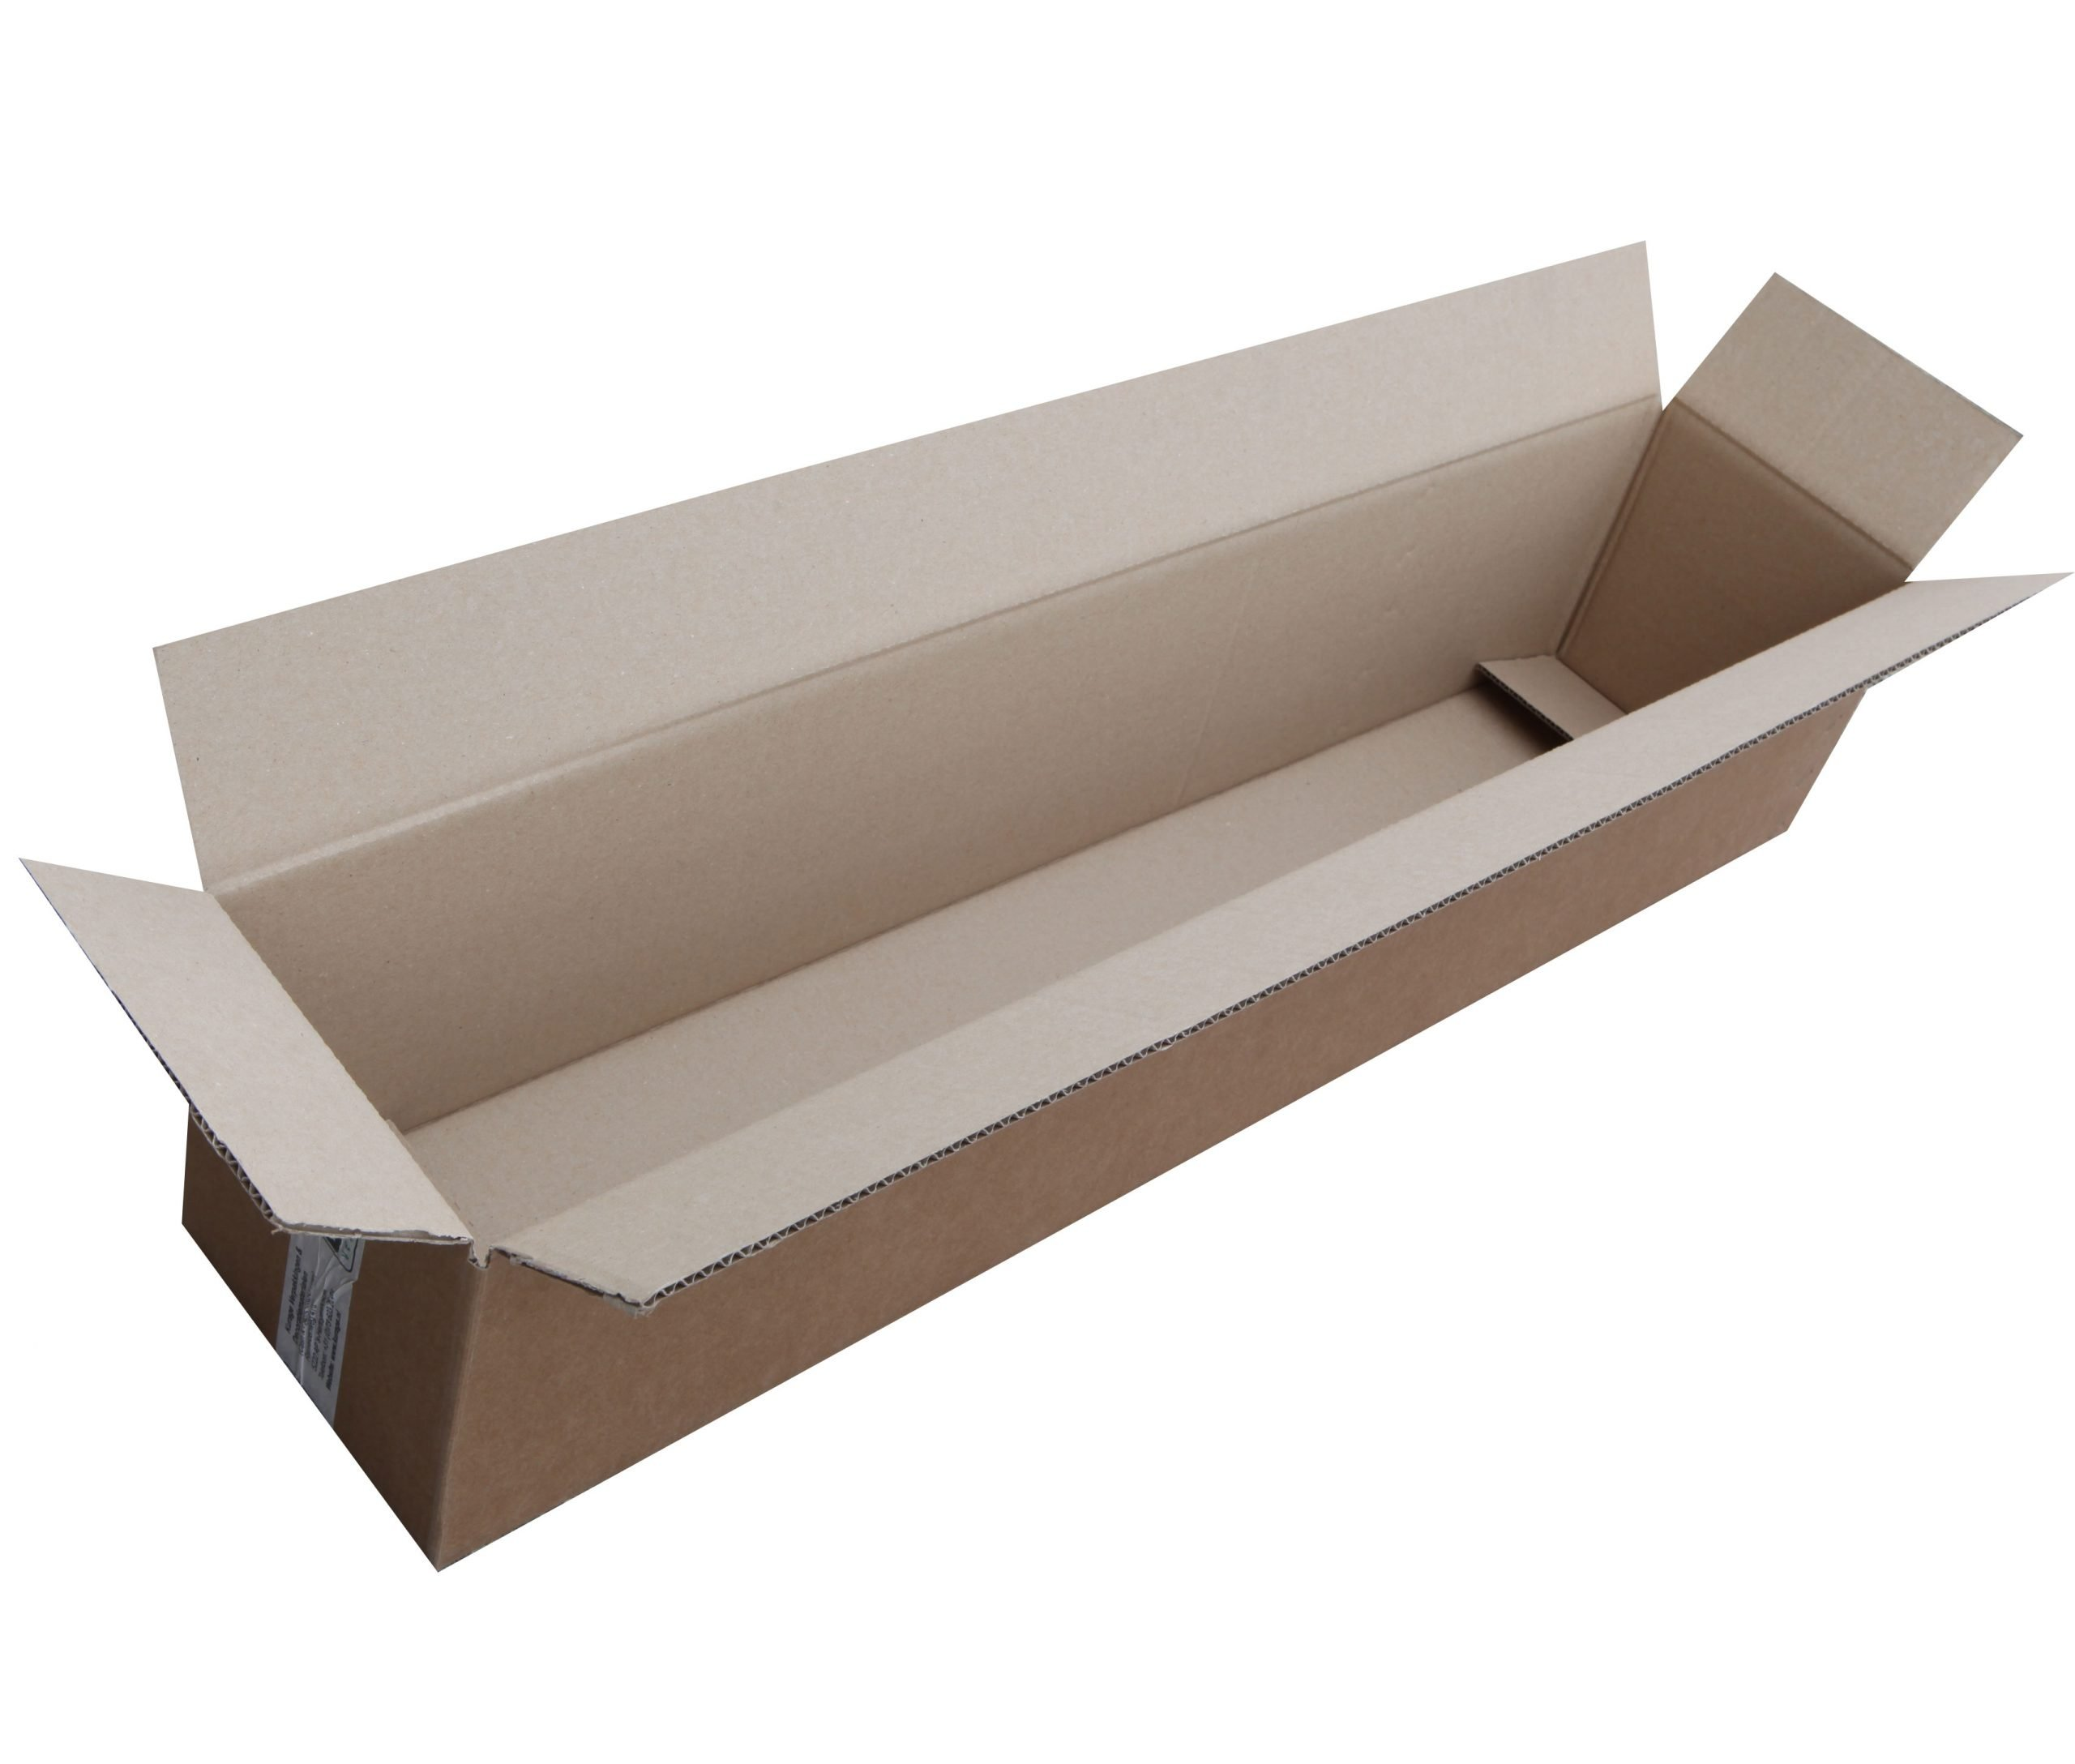 Longbox-doos 1000x200x200mm.